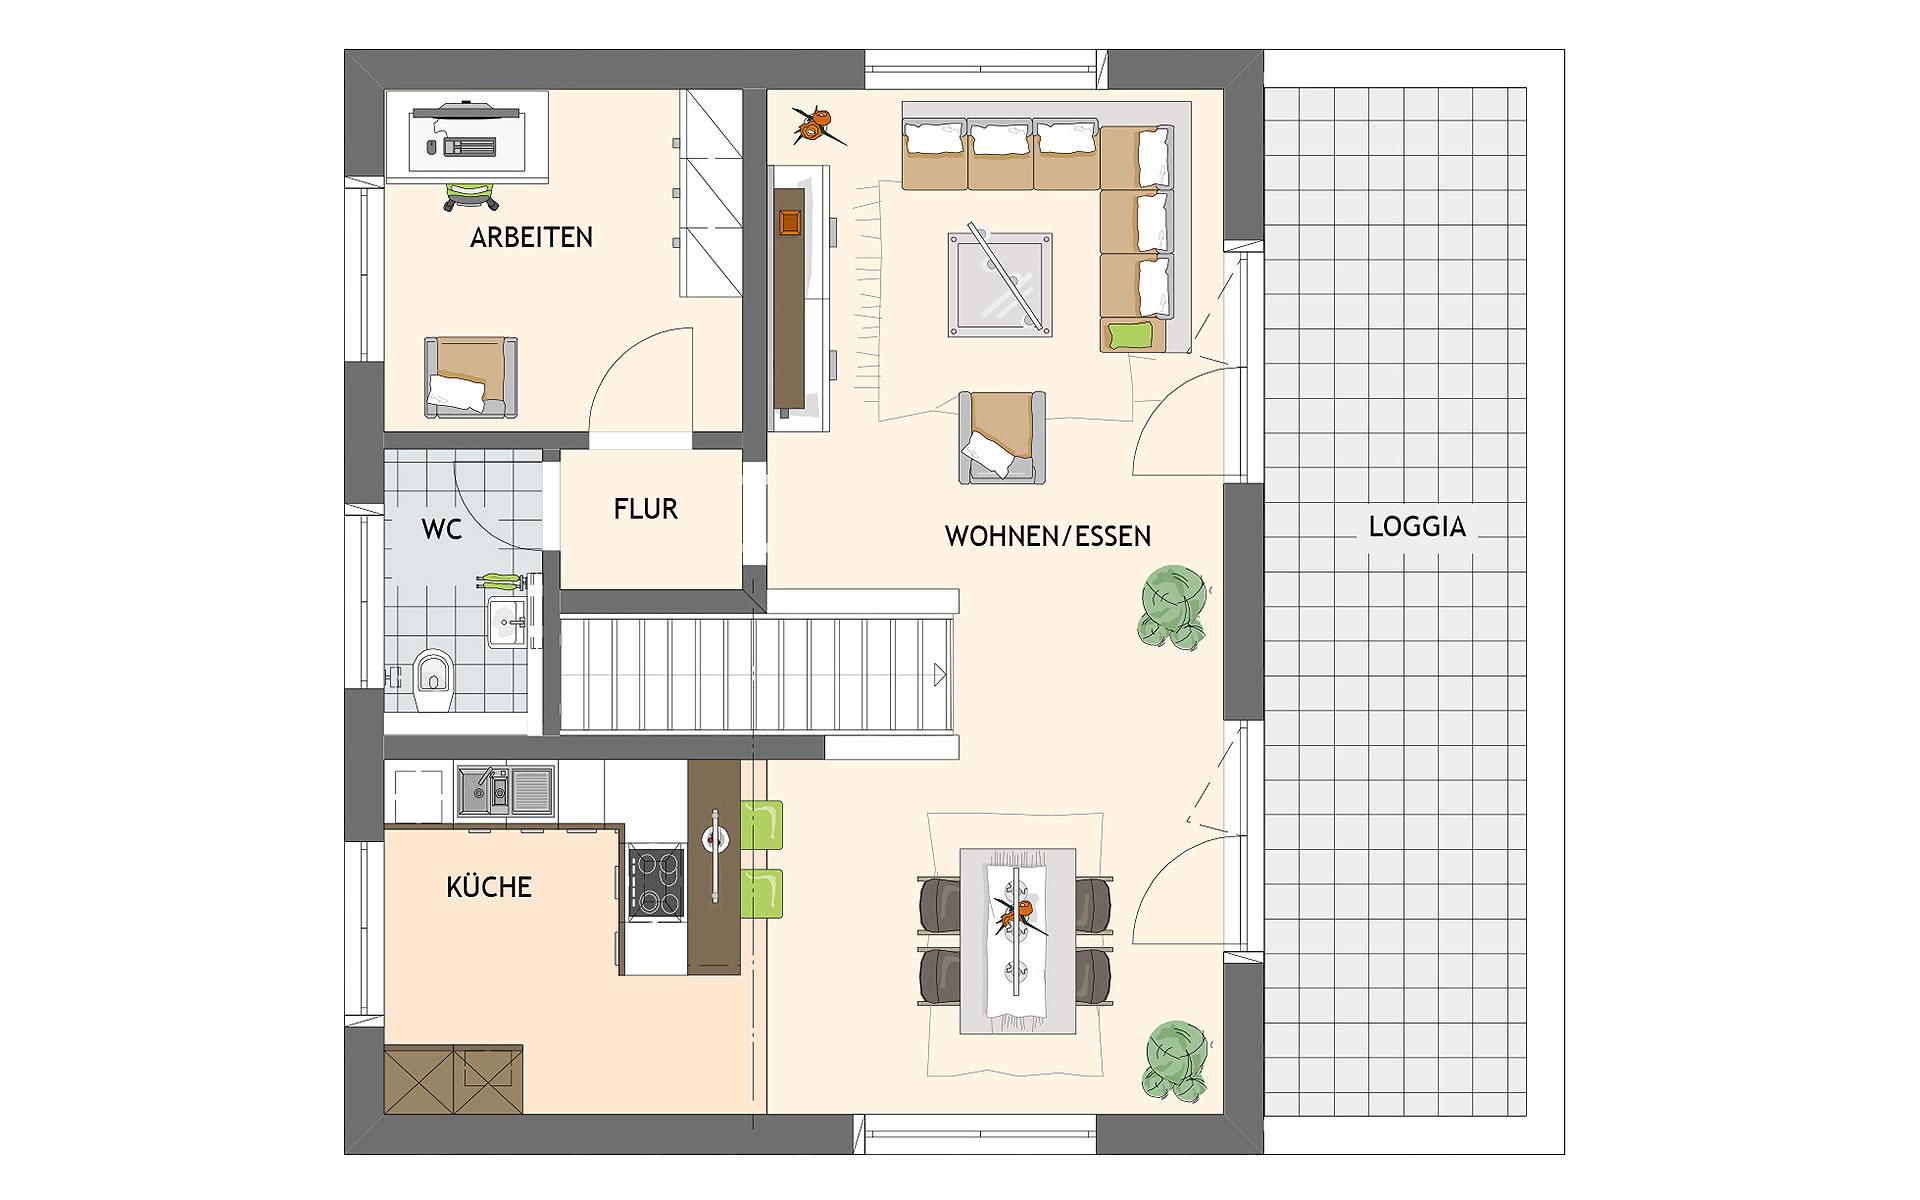 Obergeschoss ARTIS 301 von FingerHaus GmbH